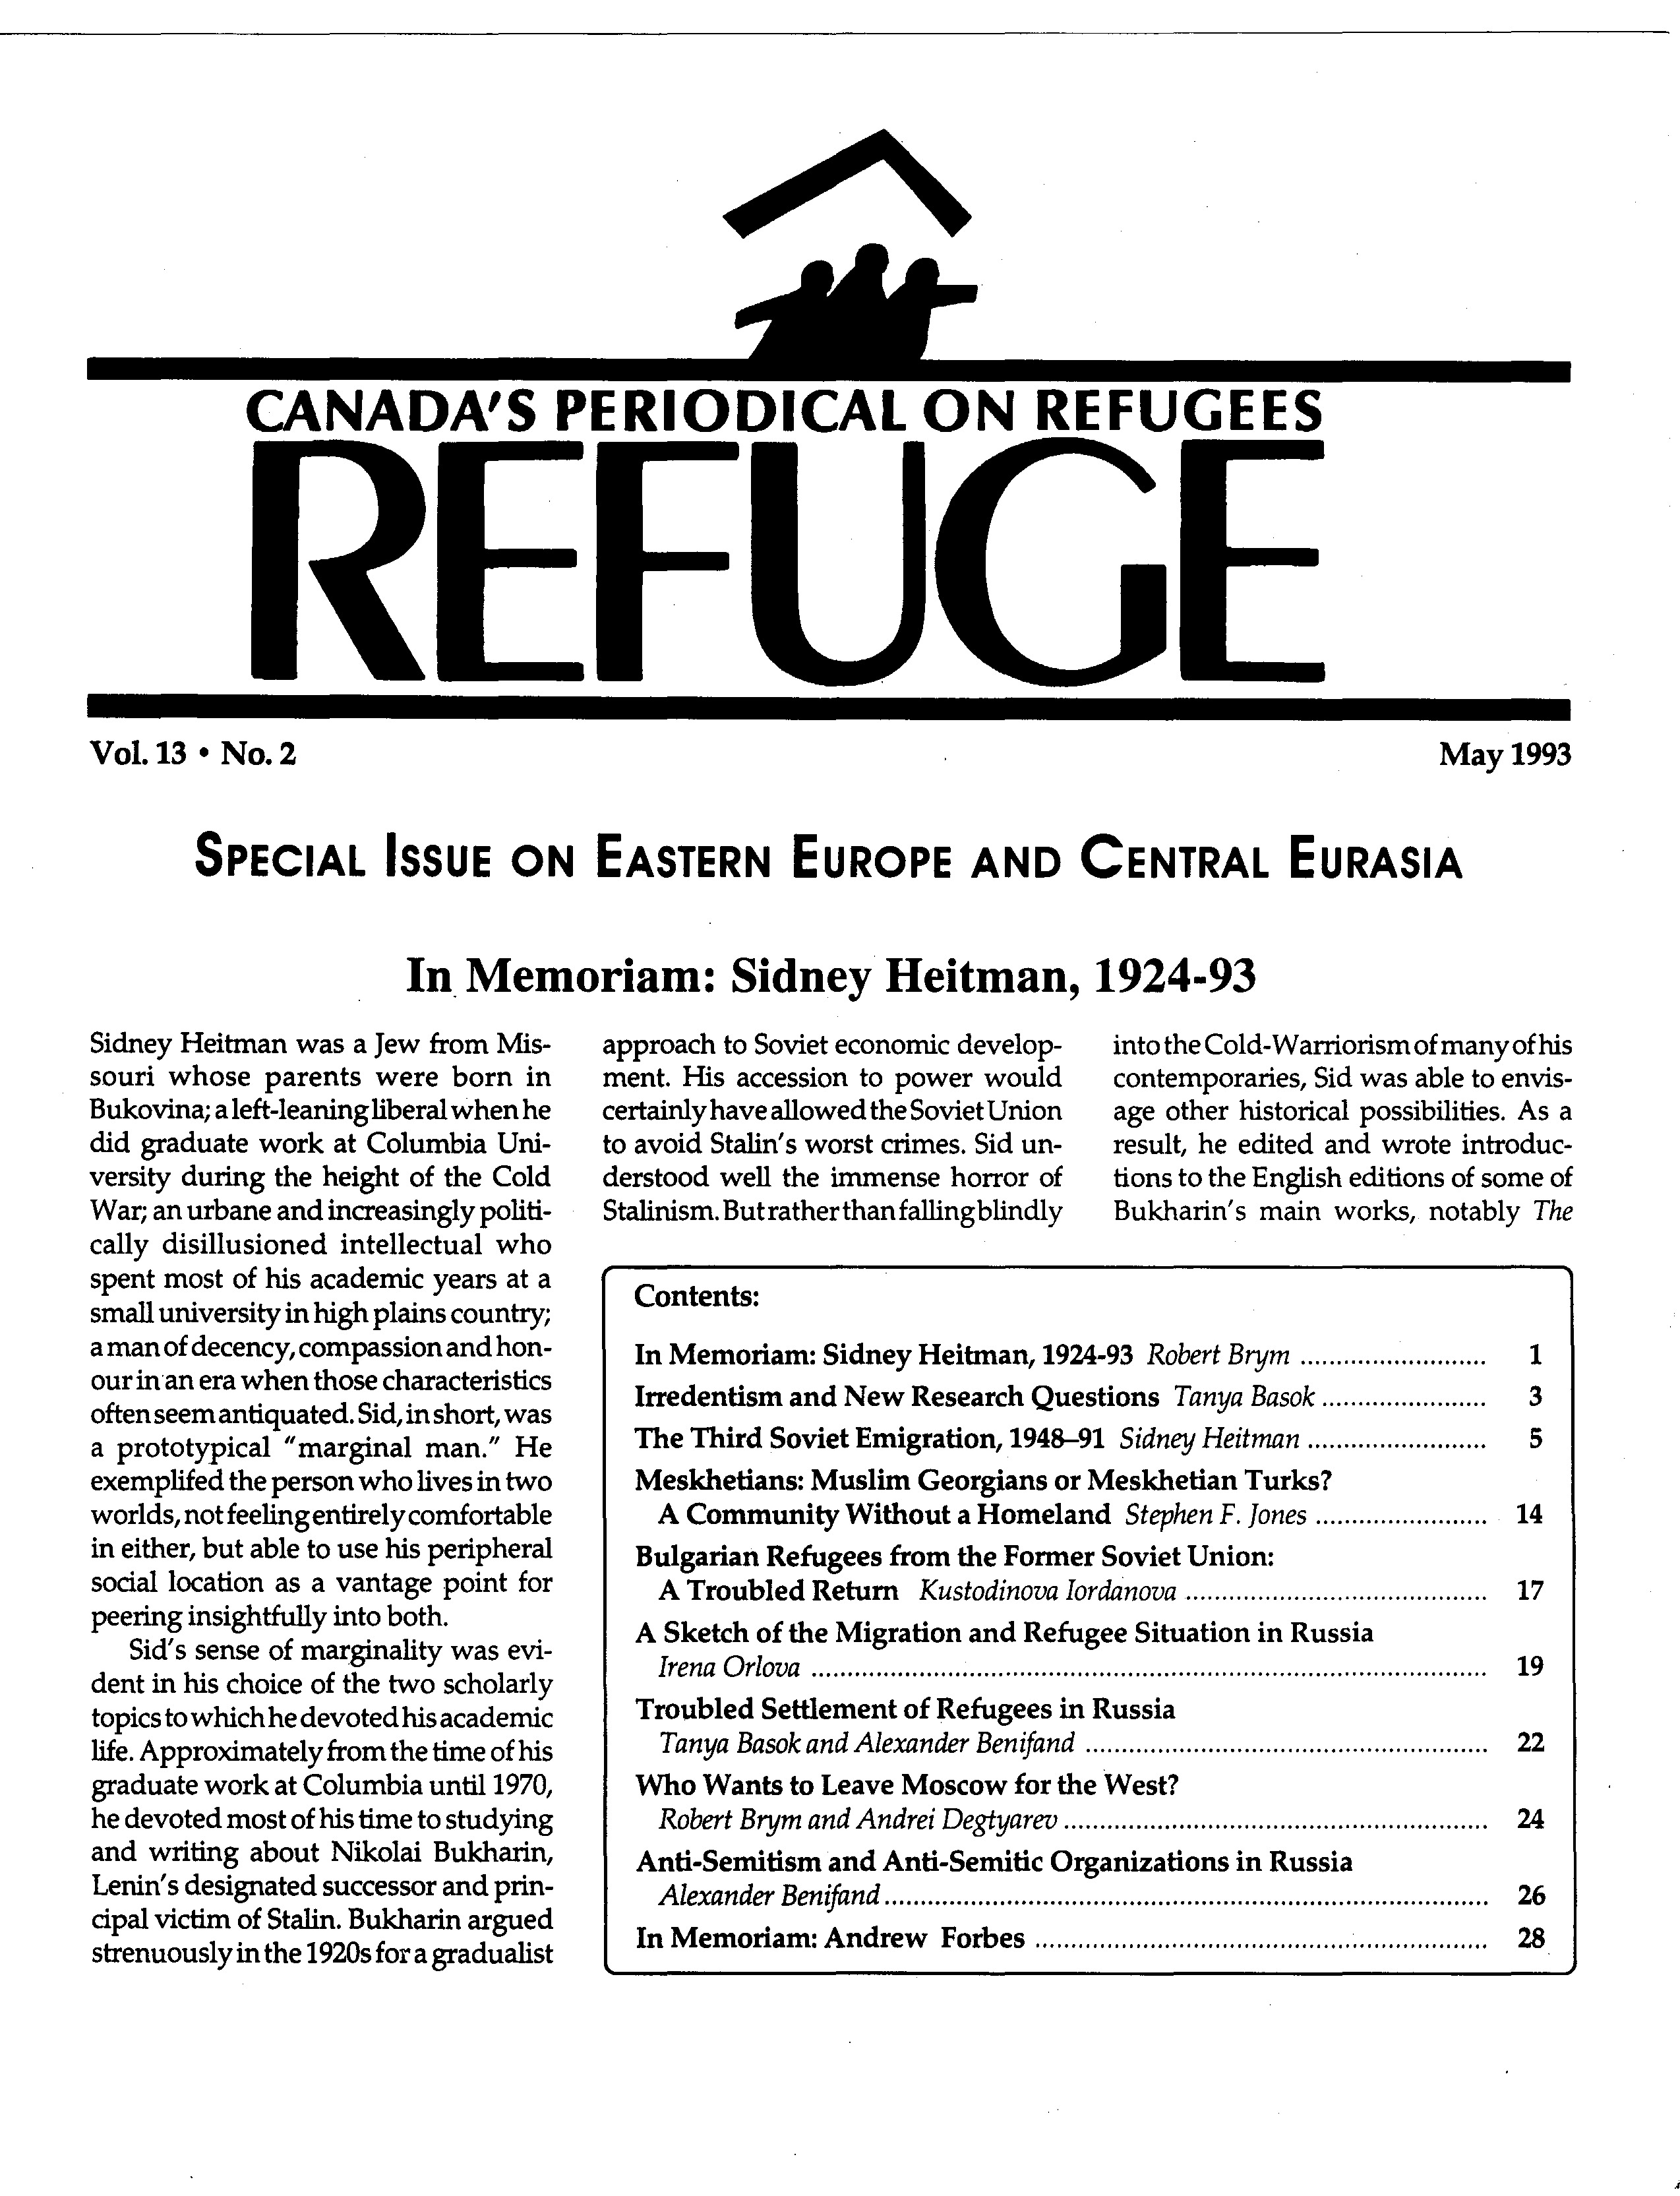 first page Refuge vol. 13.2 1993